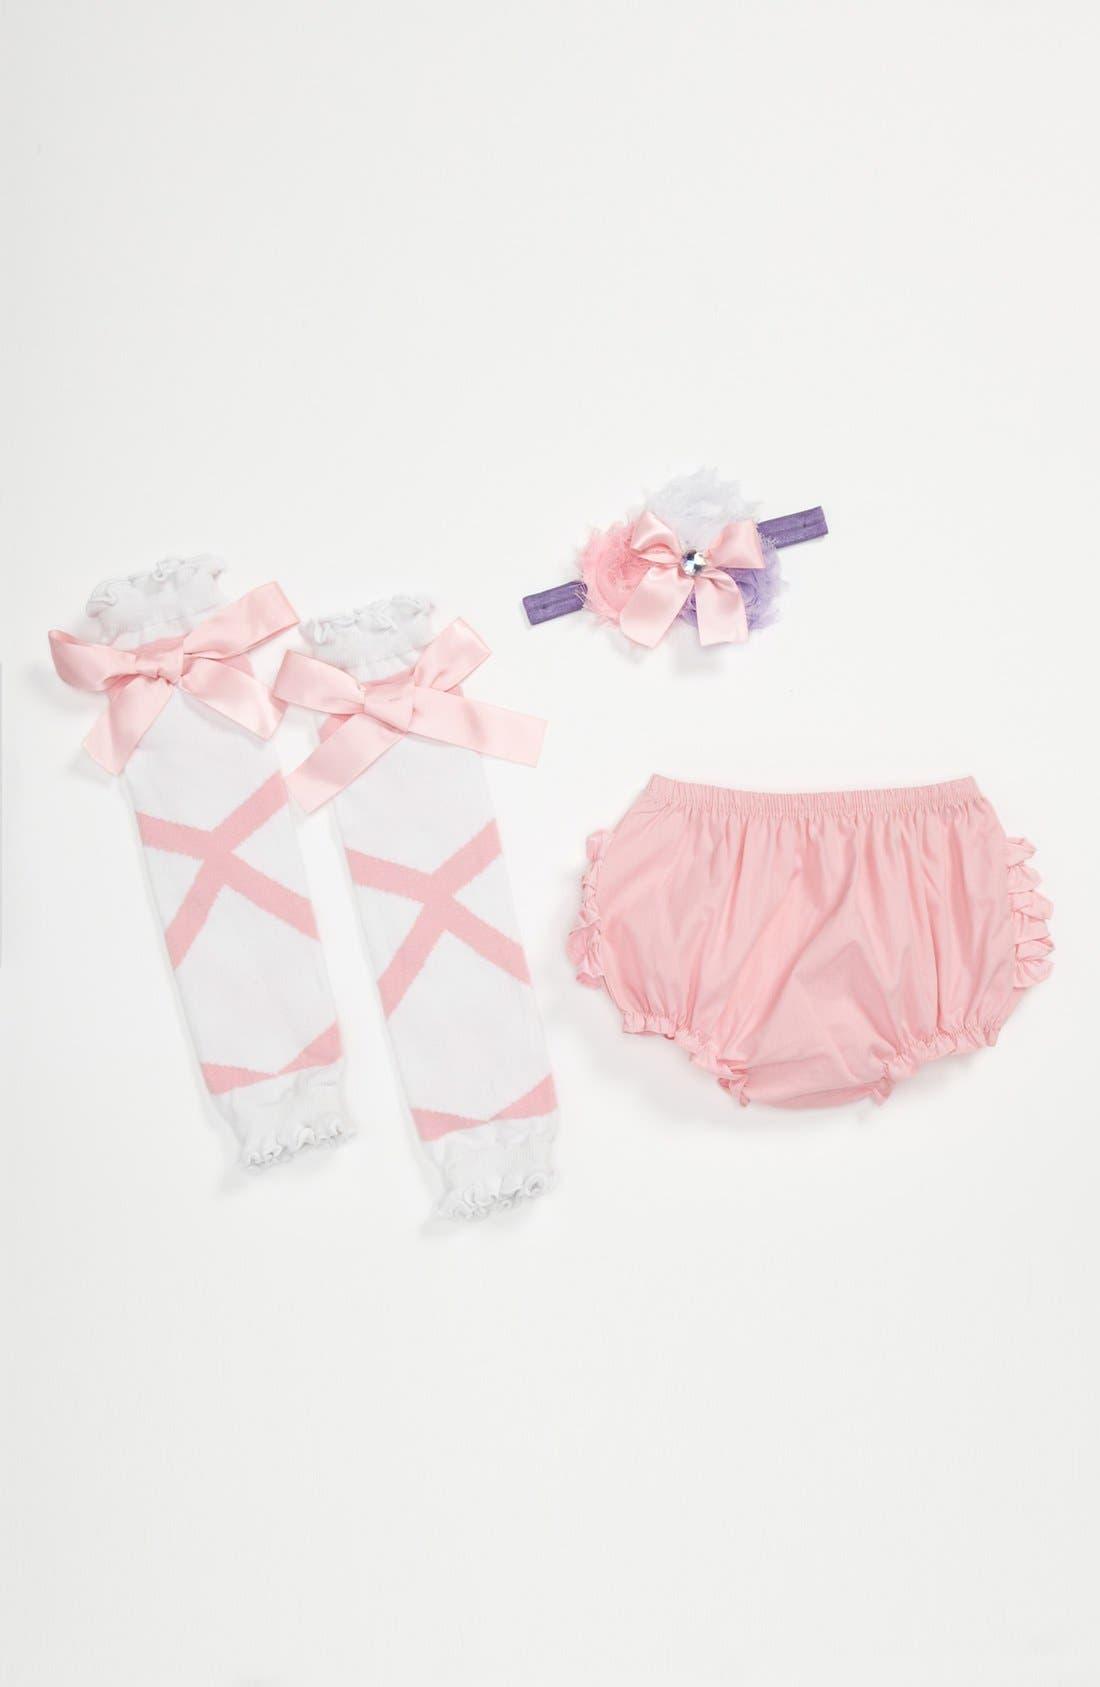 Main Image - RuffleButts 'Ballerina' Headband, Bloomers & Leg Warmers (Baby)